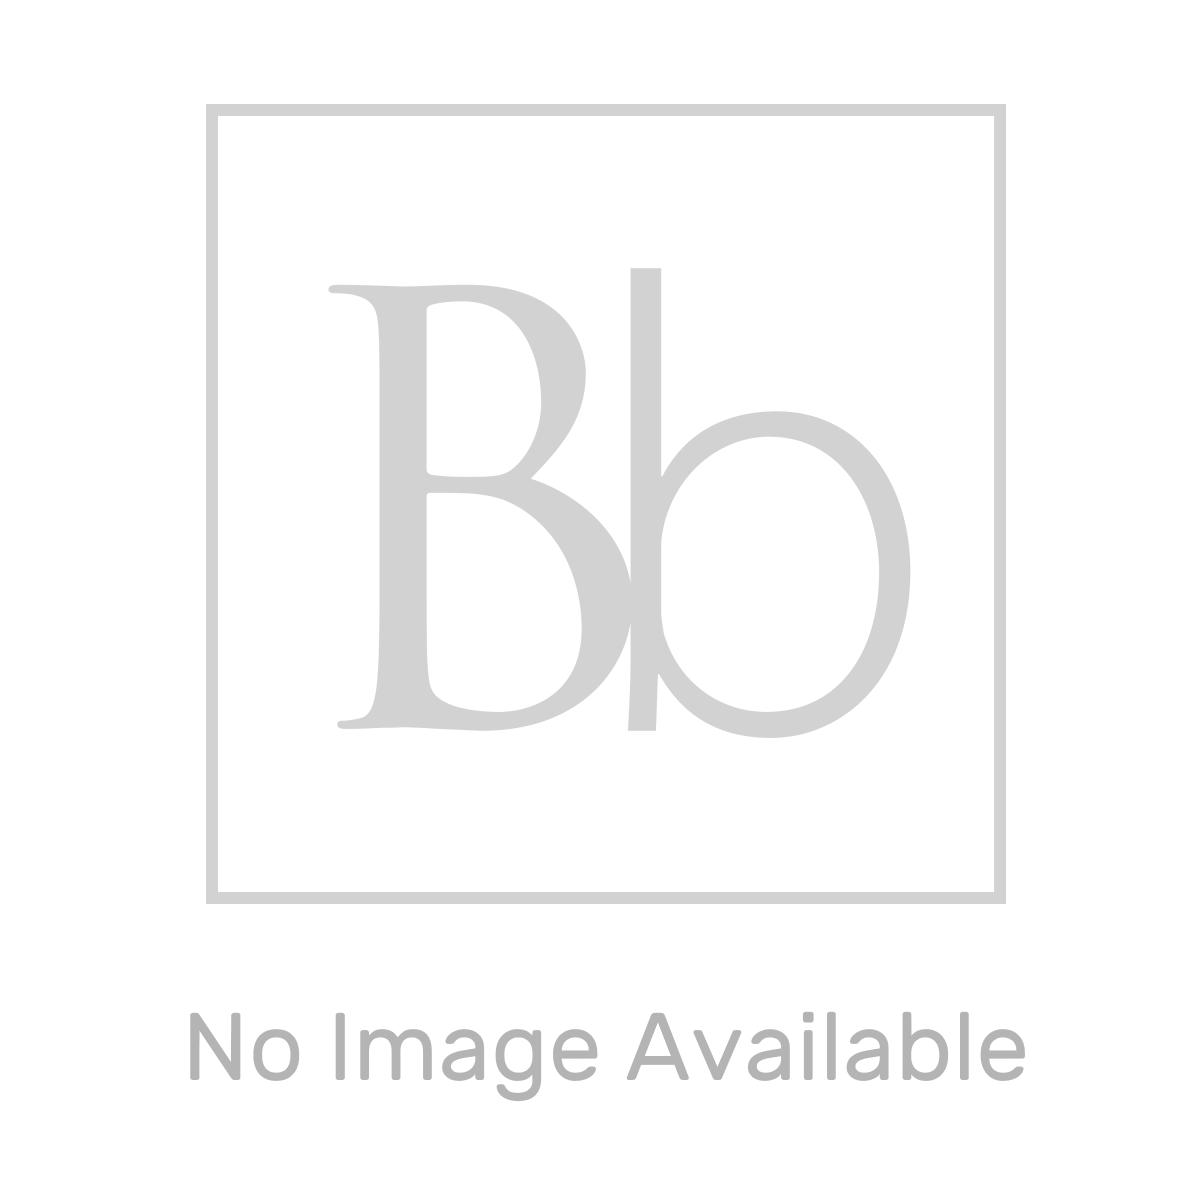 Aquadart Black Slate Shower Tray 1700 x 700 Dimension